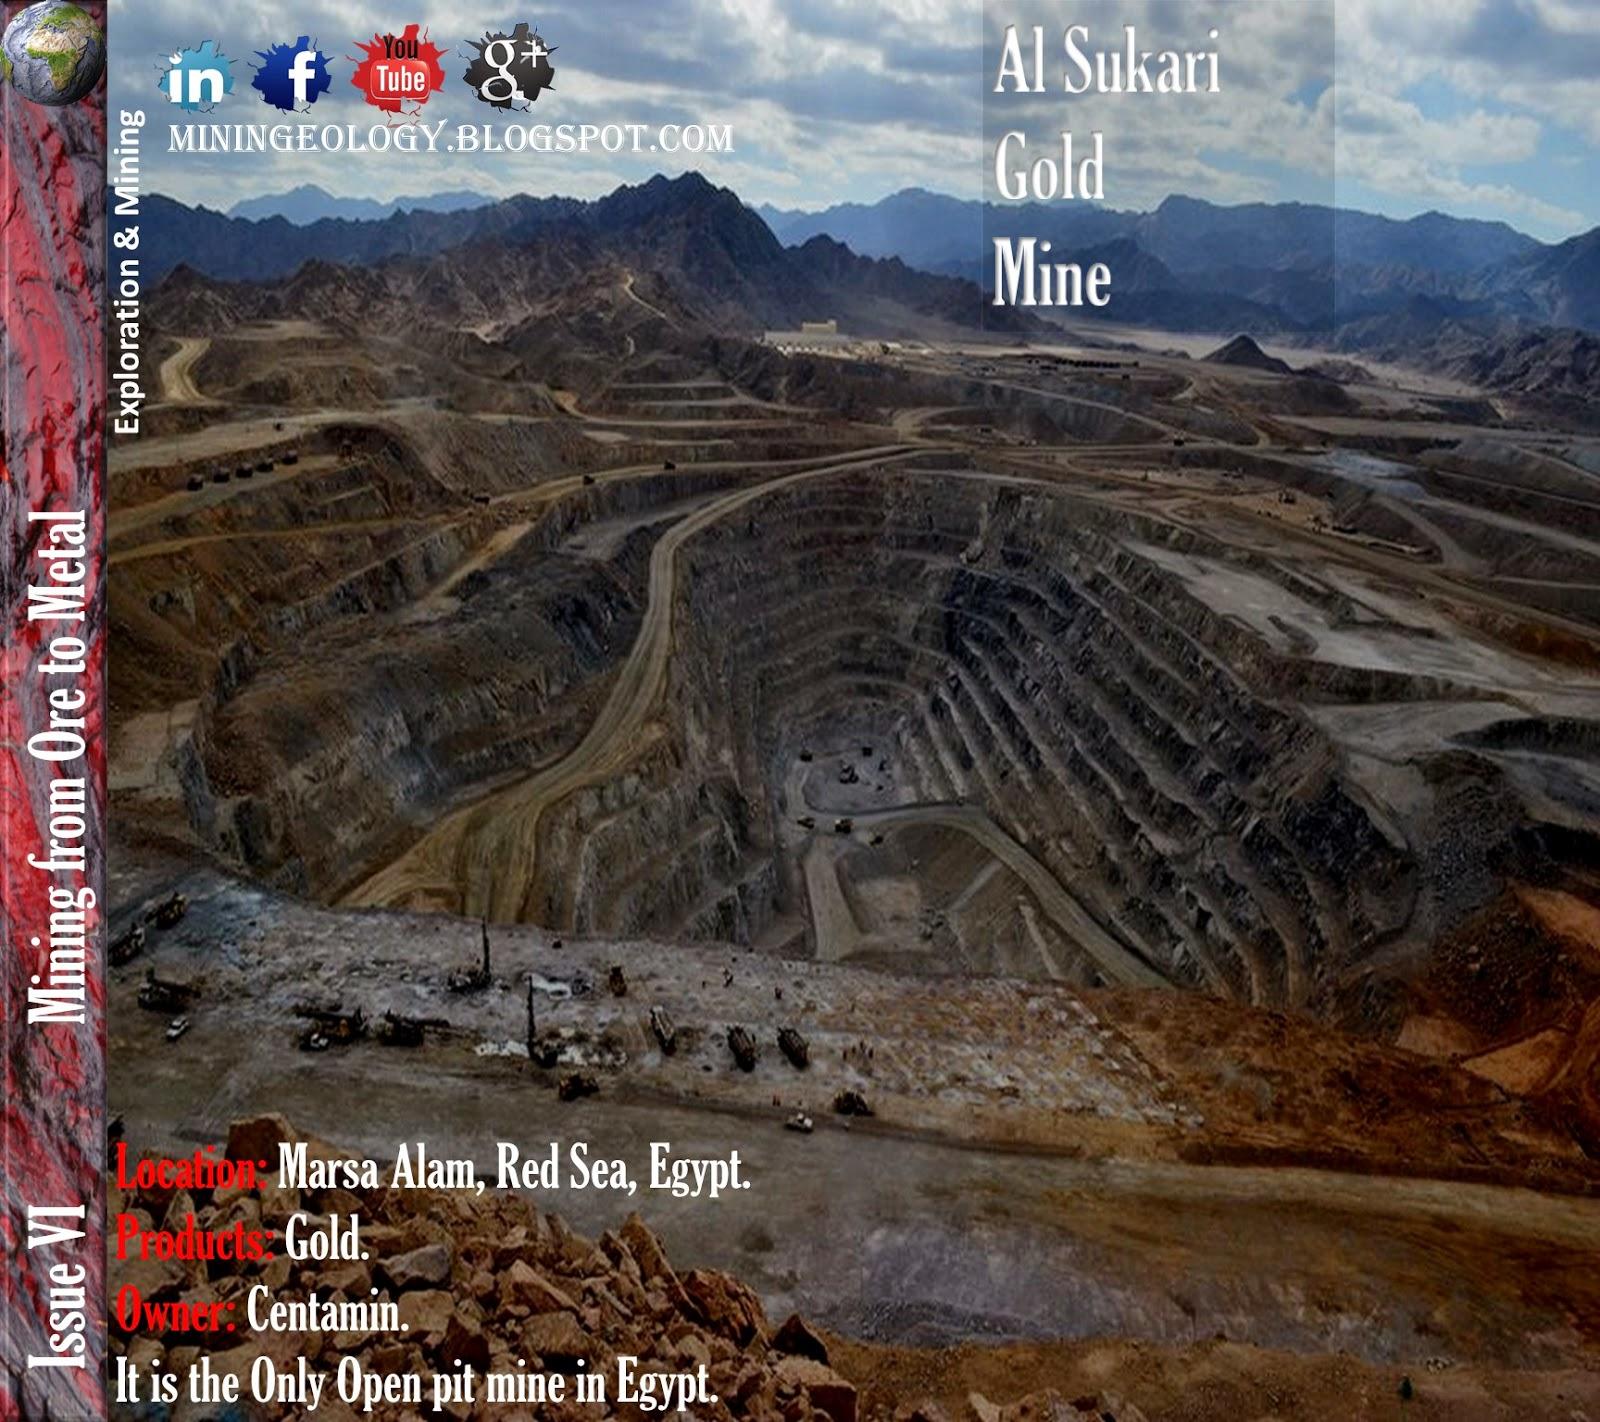 Al Sukari Gold Mine